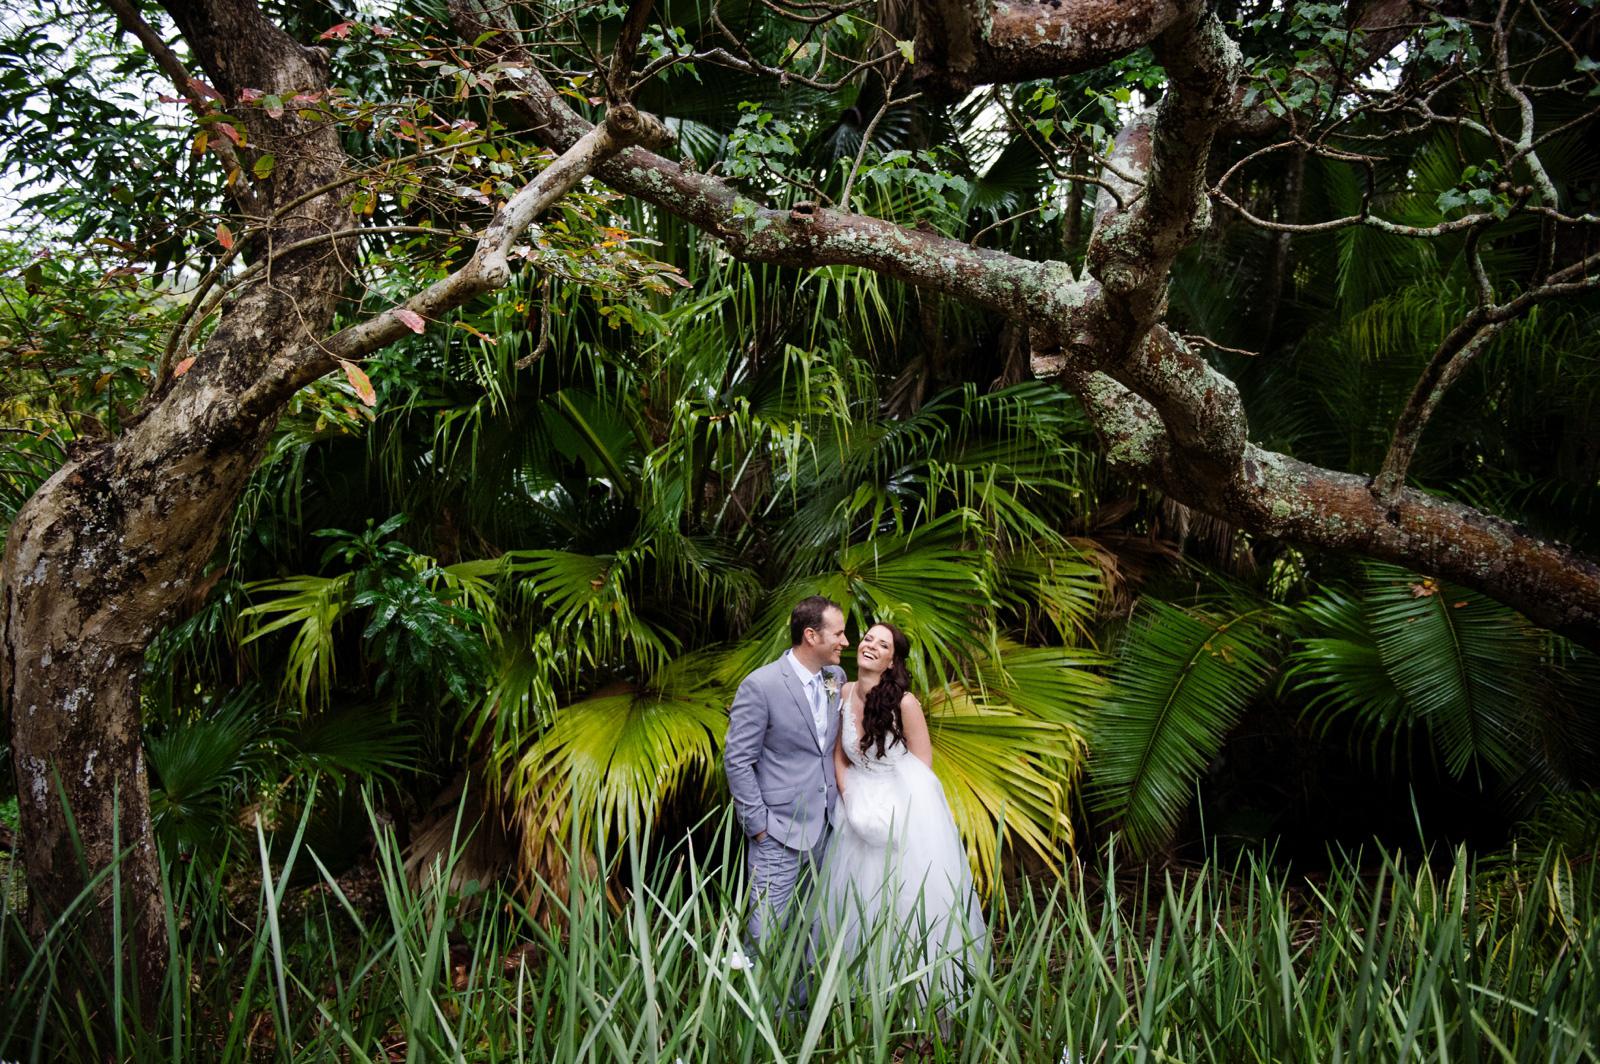 estuary hotel bride and groom